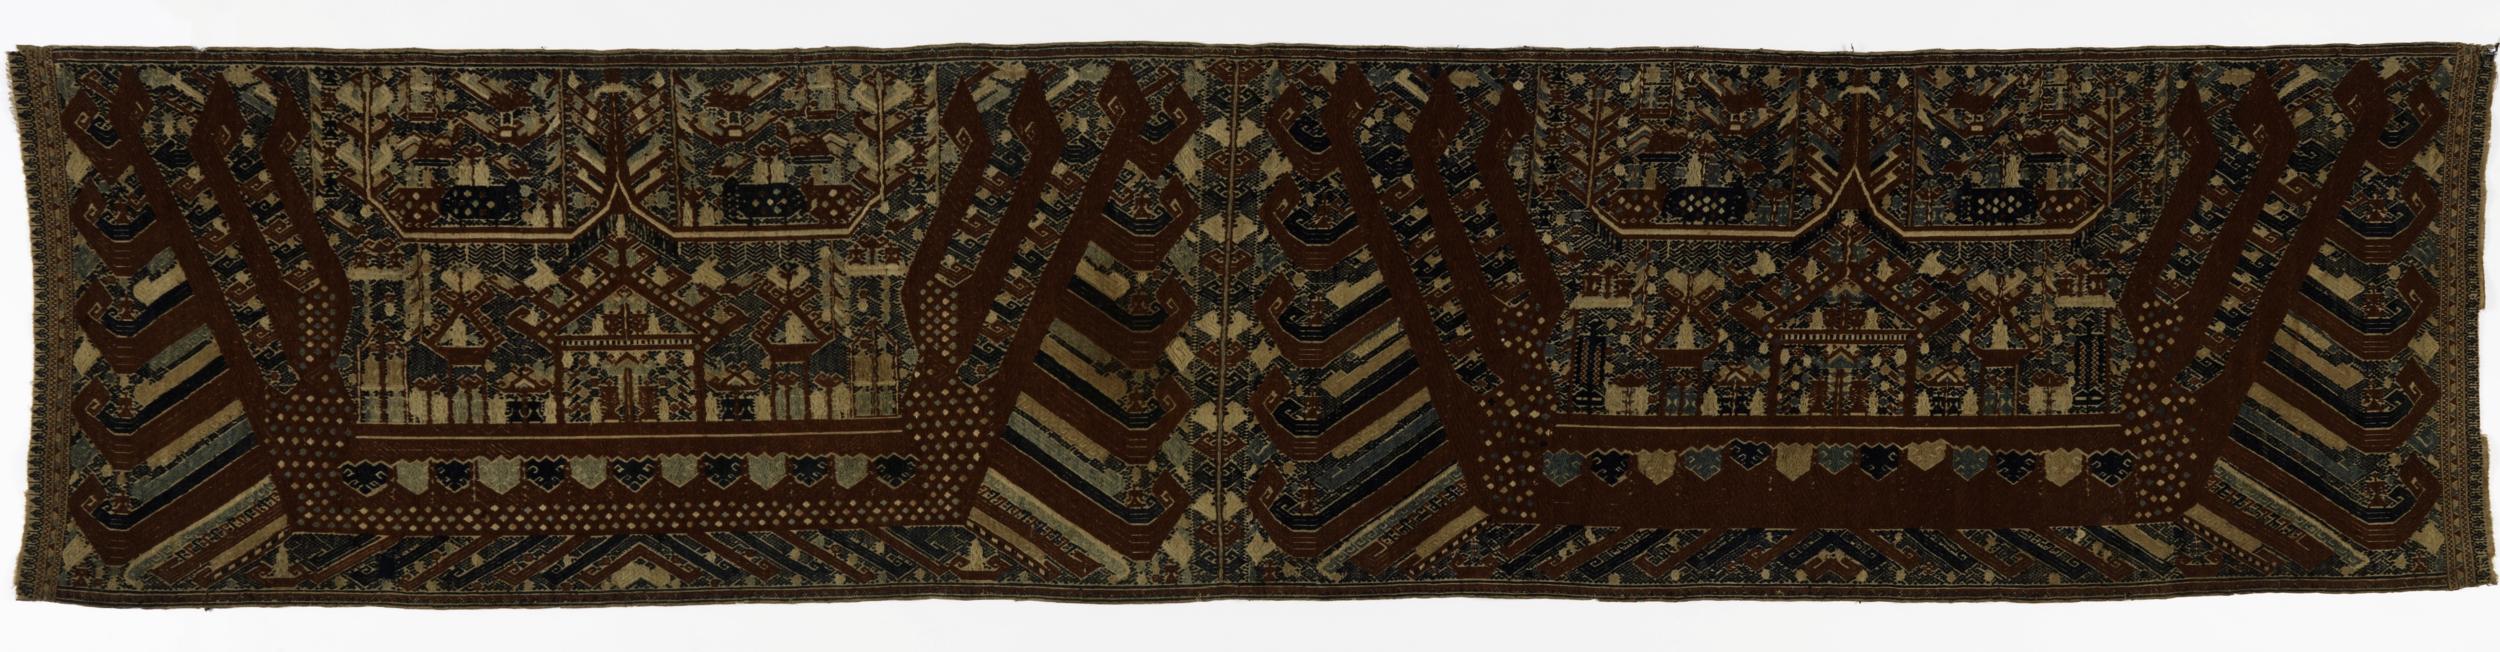 Ceremonial Banner Cloth |  Palepai  © Cooper Hewitt Smithsonian Design Museum | New York, USA